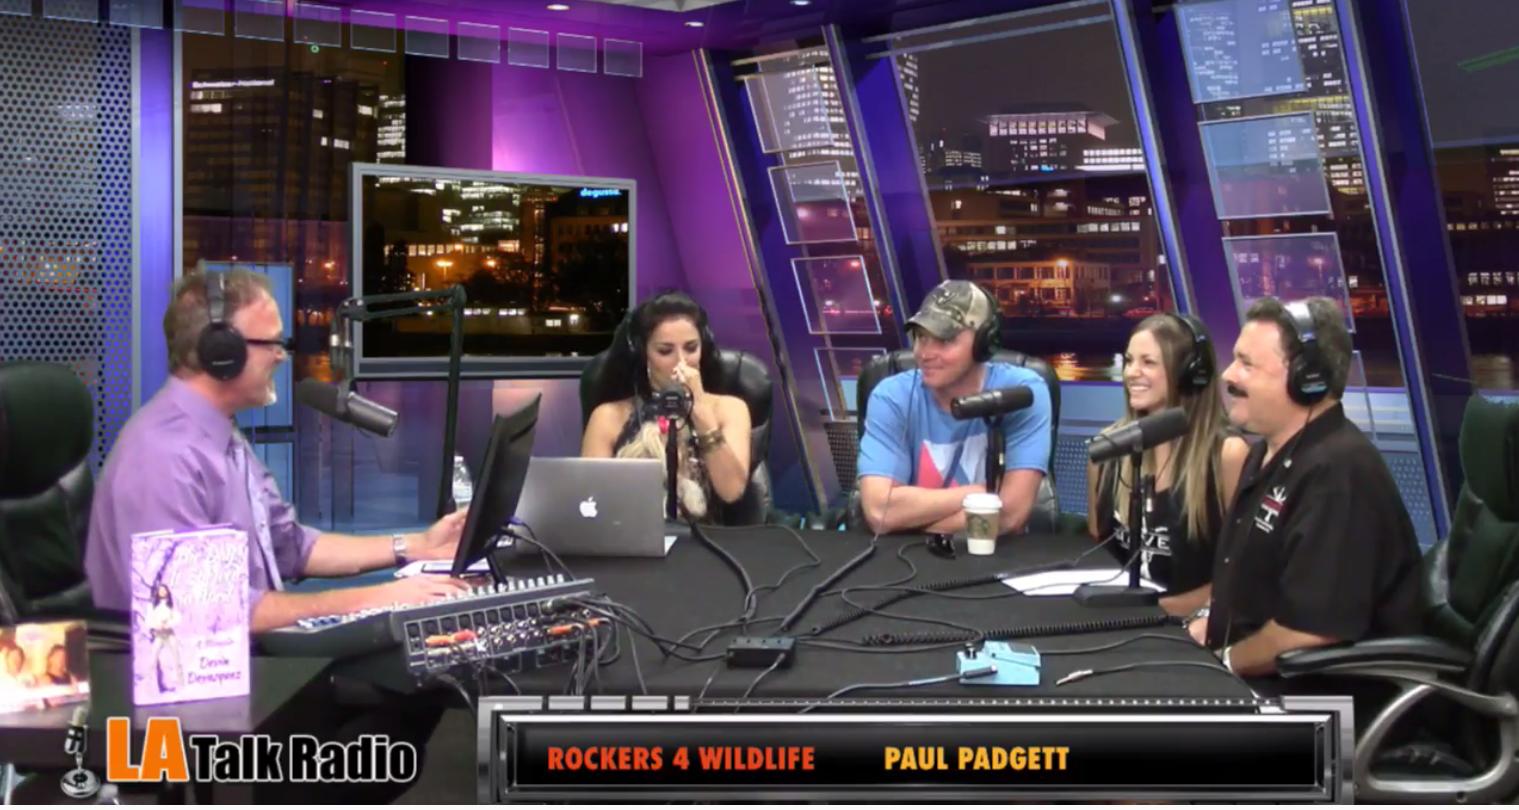 LA Talk Radio Rockers for Wildlife with Paul Padgett